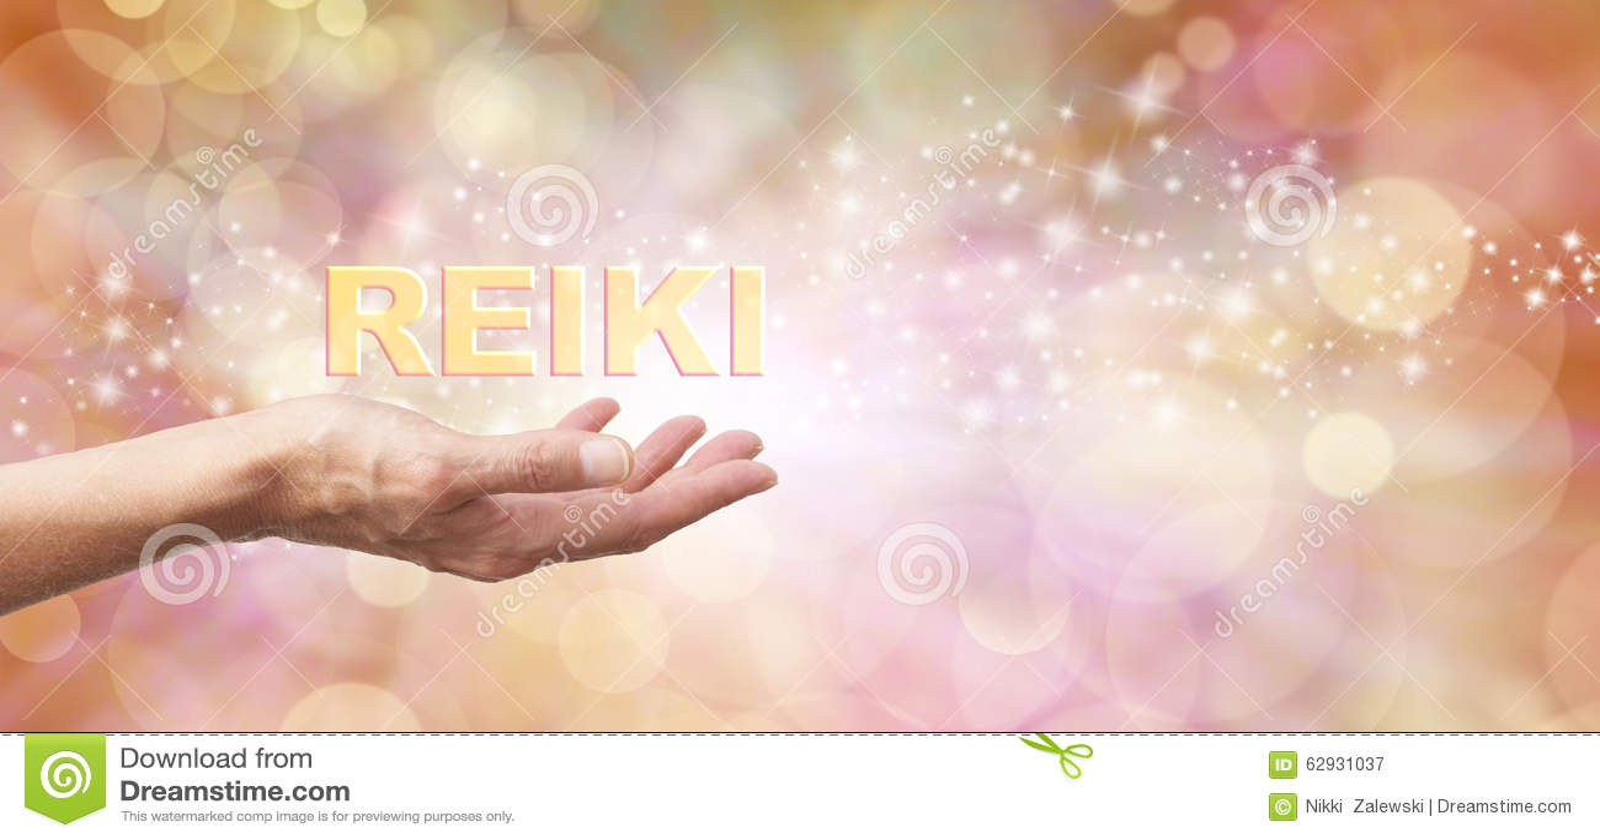 Reiki Healing Hand Cartoon Vector Cartoondealer Com 7968707